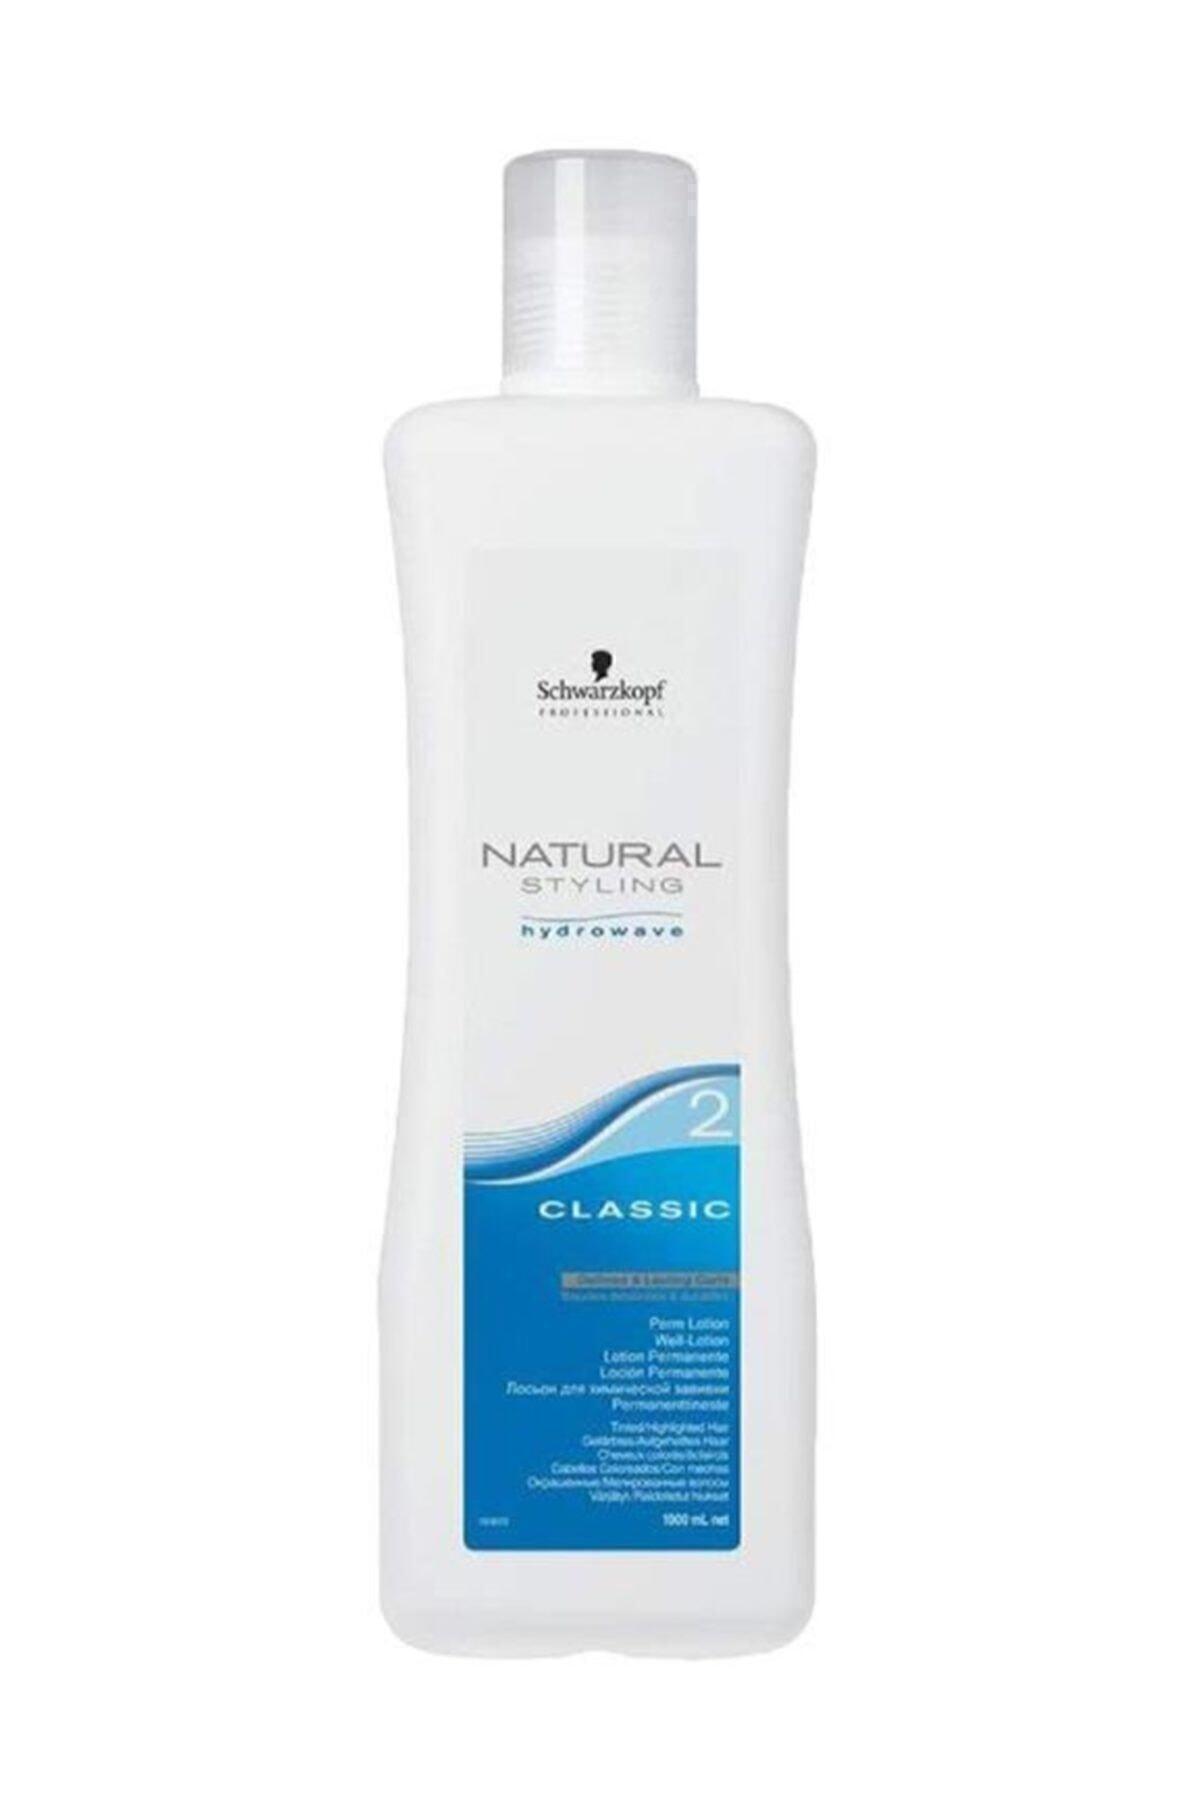 SCHWARZKOPF HAIR MASCARA Natural Styling Kla Perma Ilacı No 2 1000 ml 1